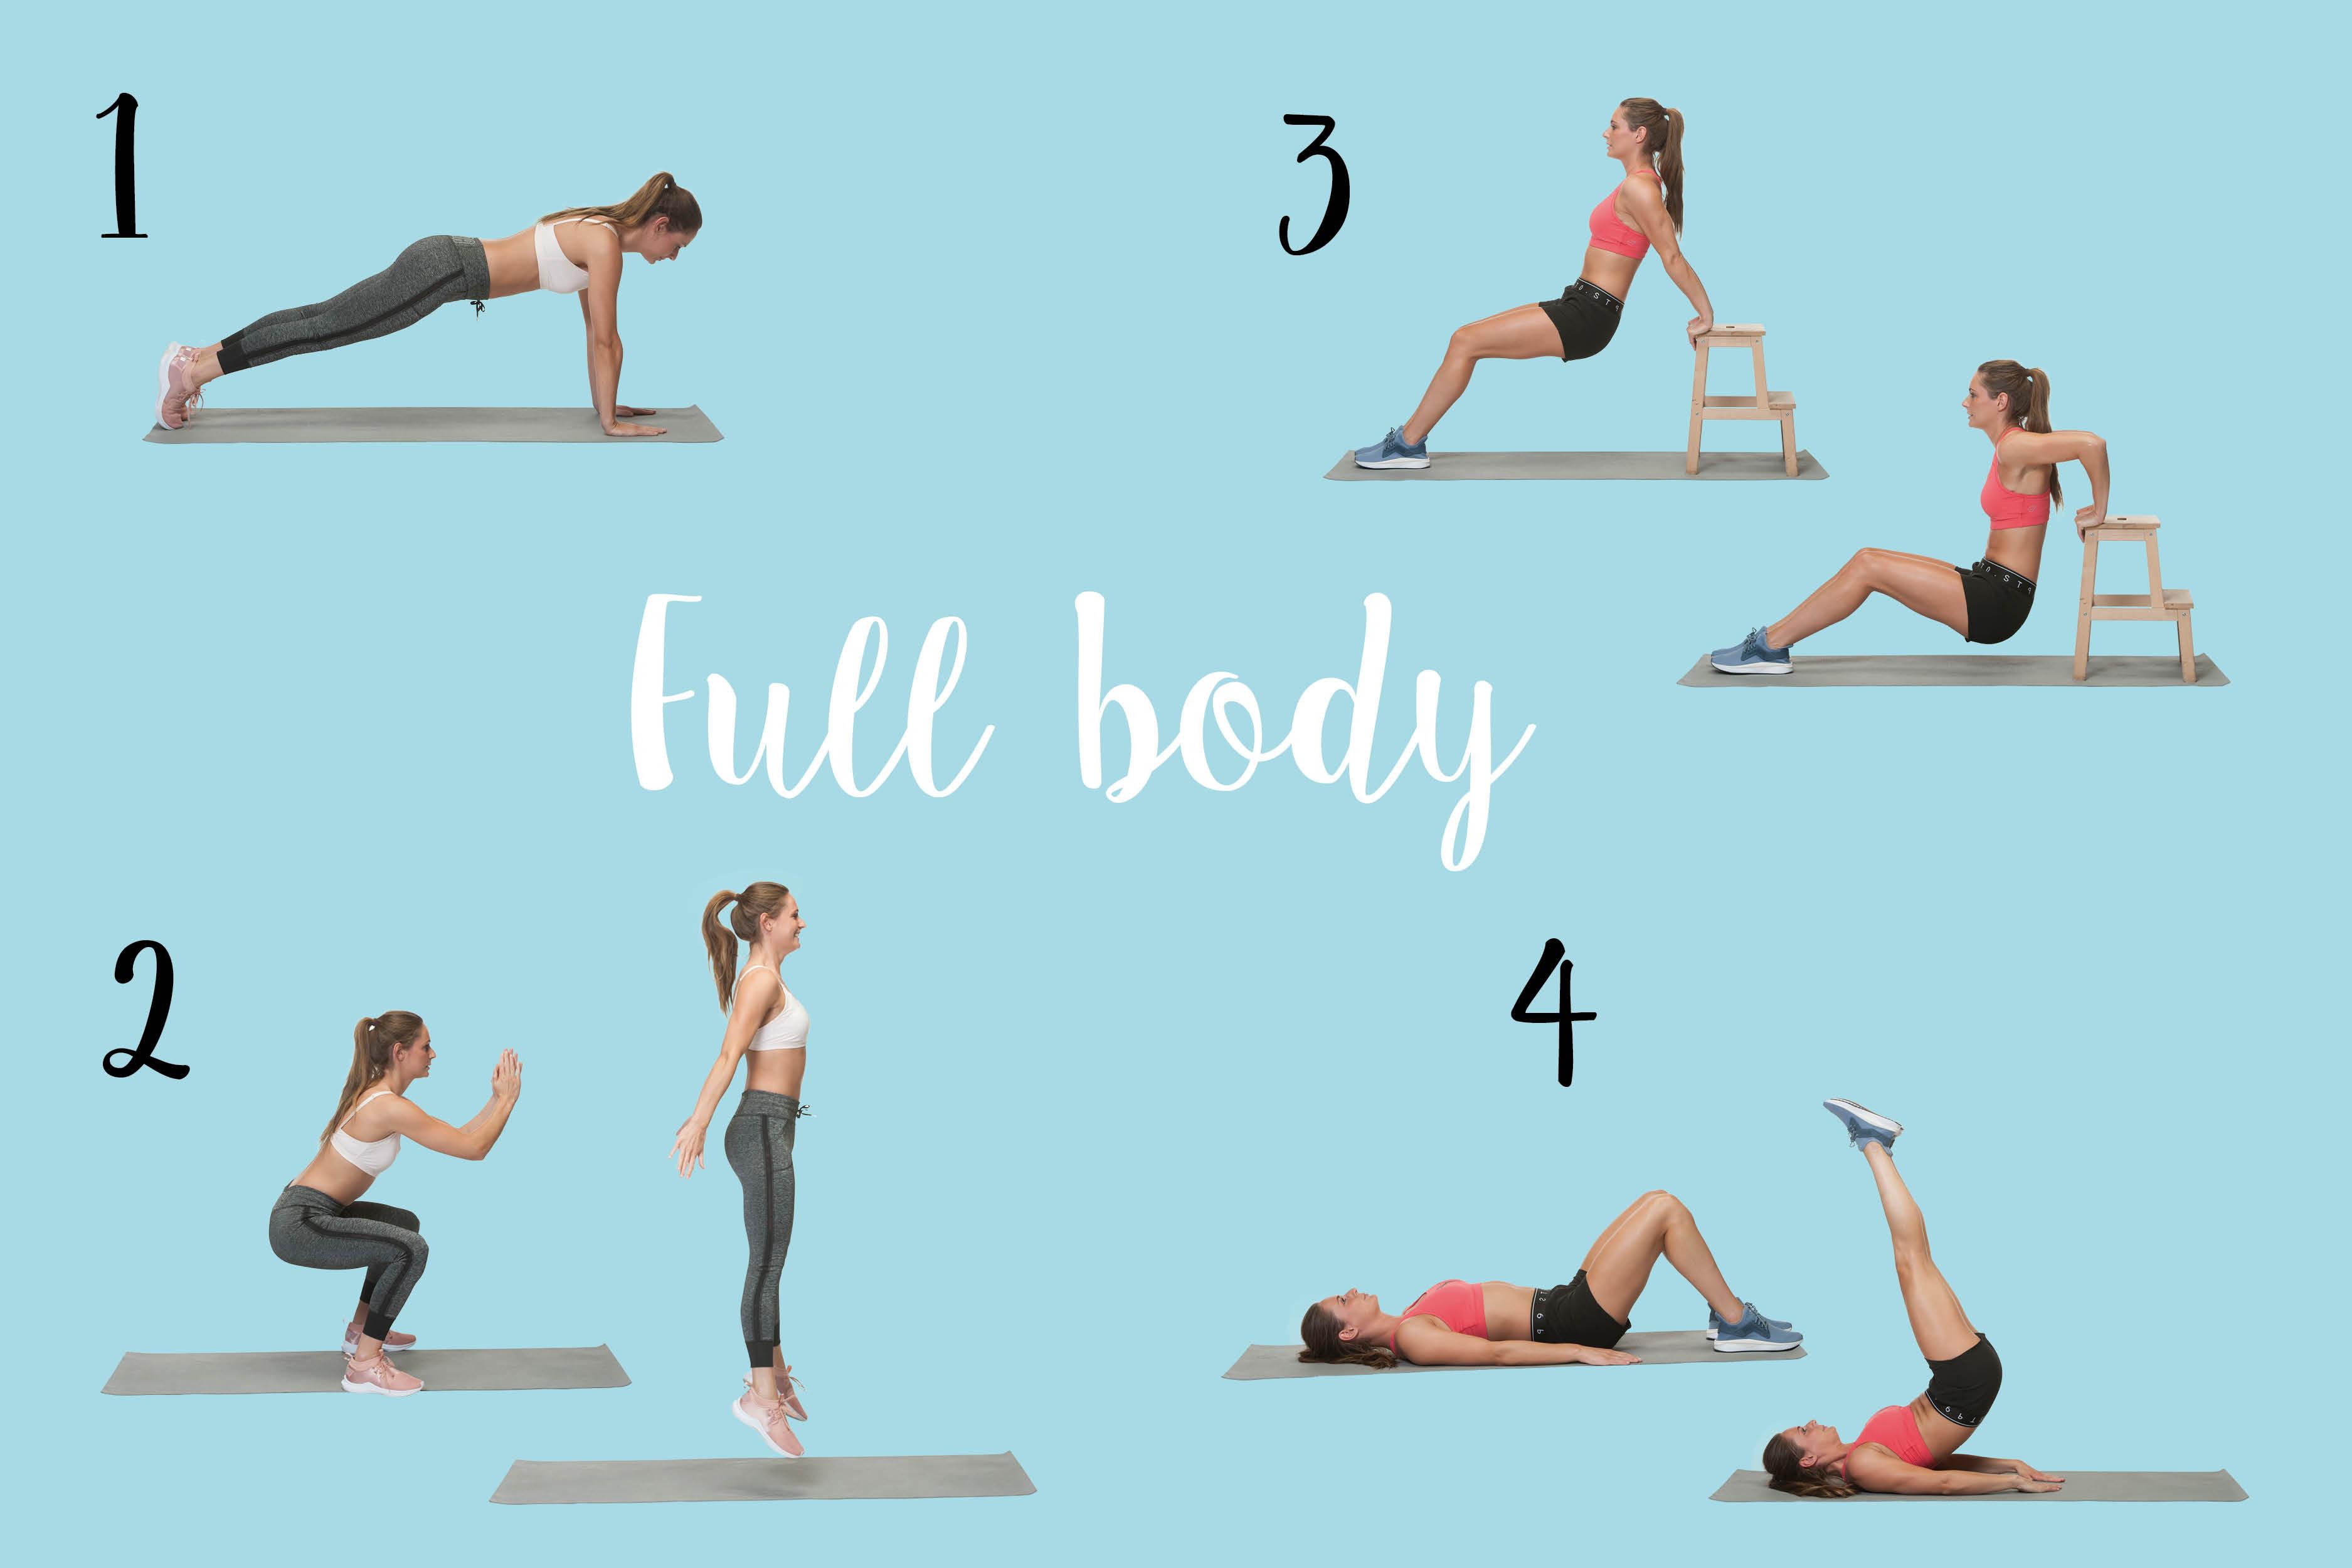 Verbazingwekkend Doe je mee? Full body workout voor thuis of in de gym - I Love Health SK-34